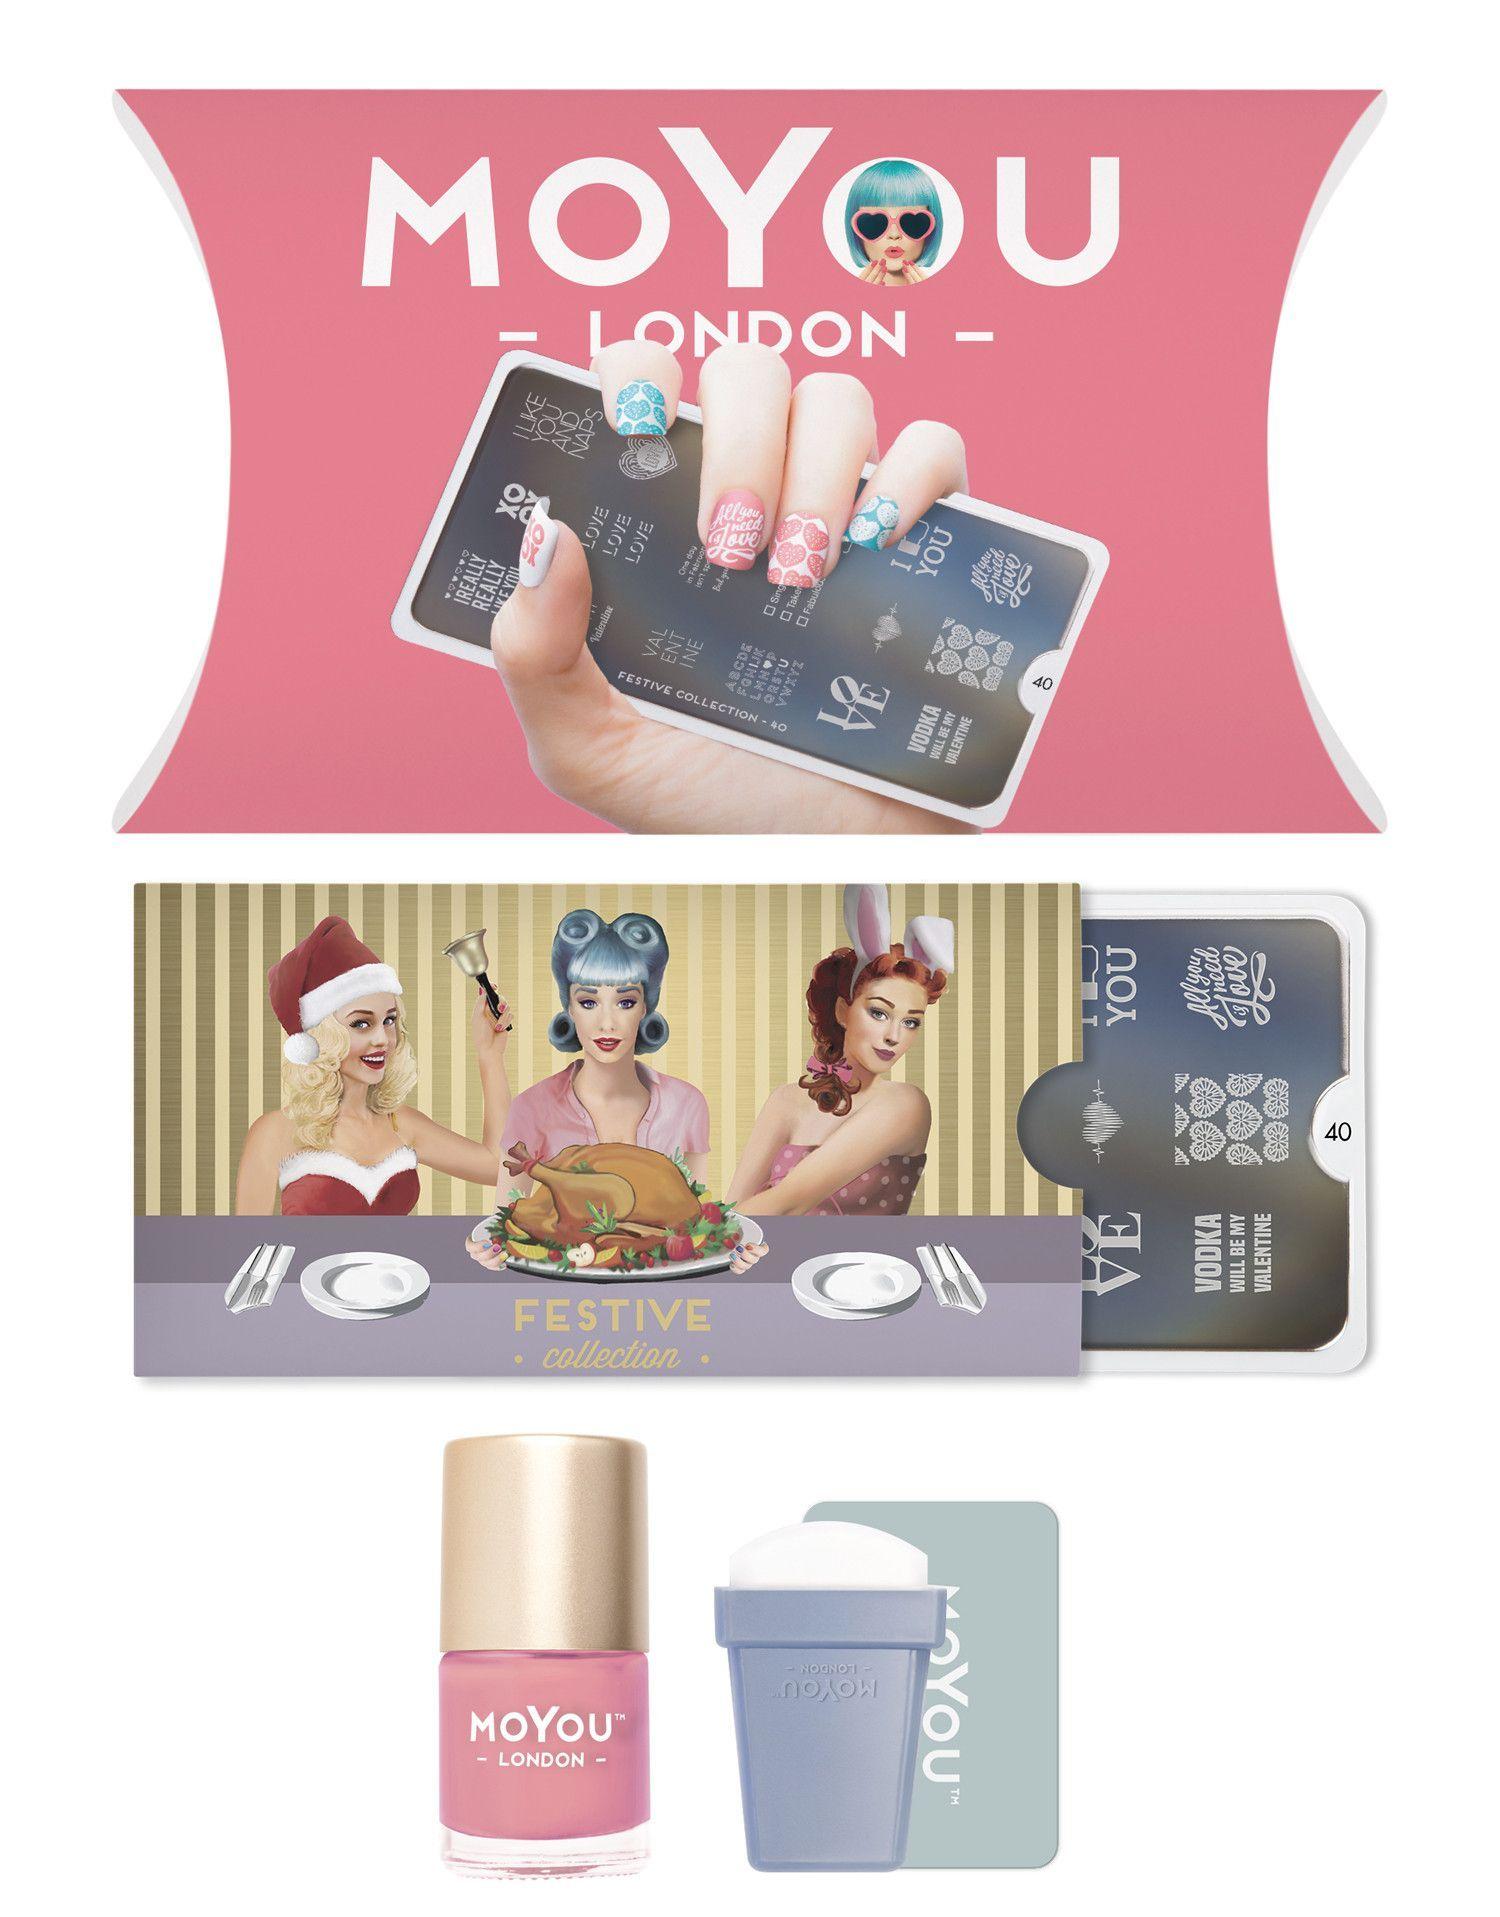 MoYou-London - Festive Stamping Kit